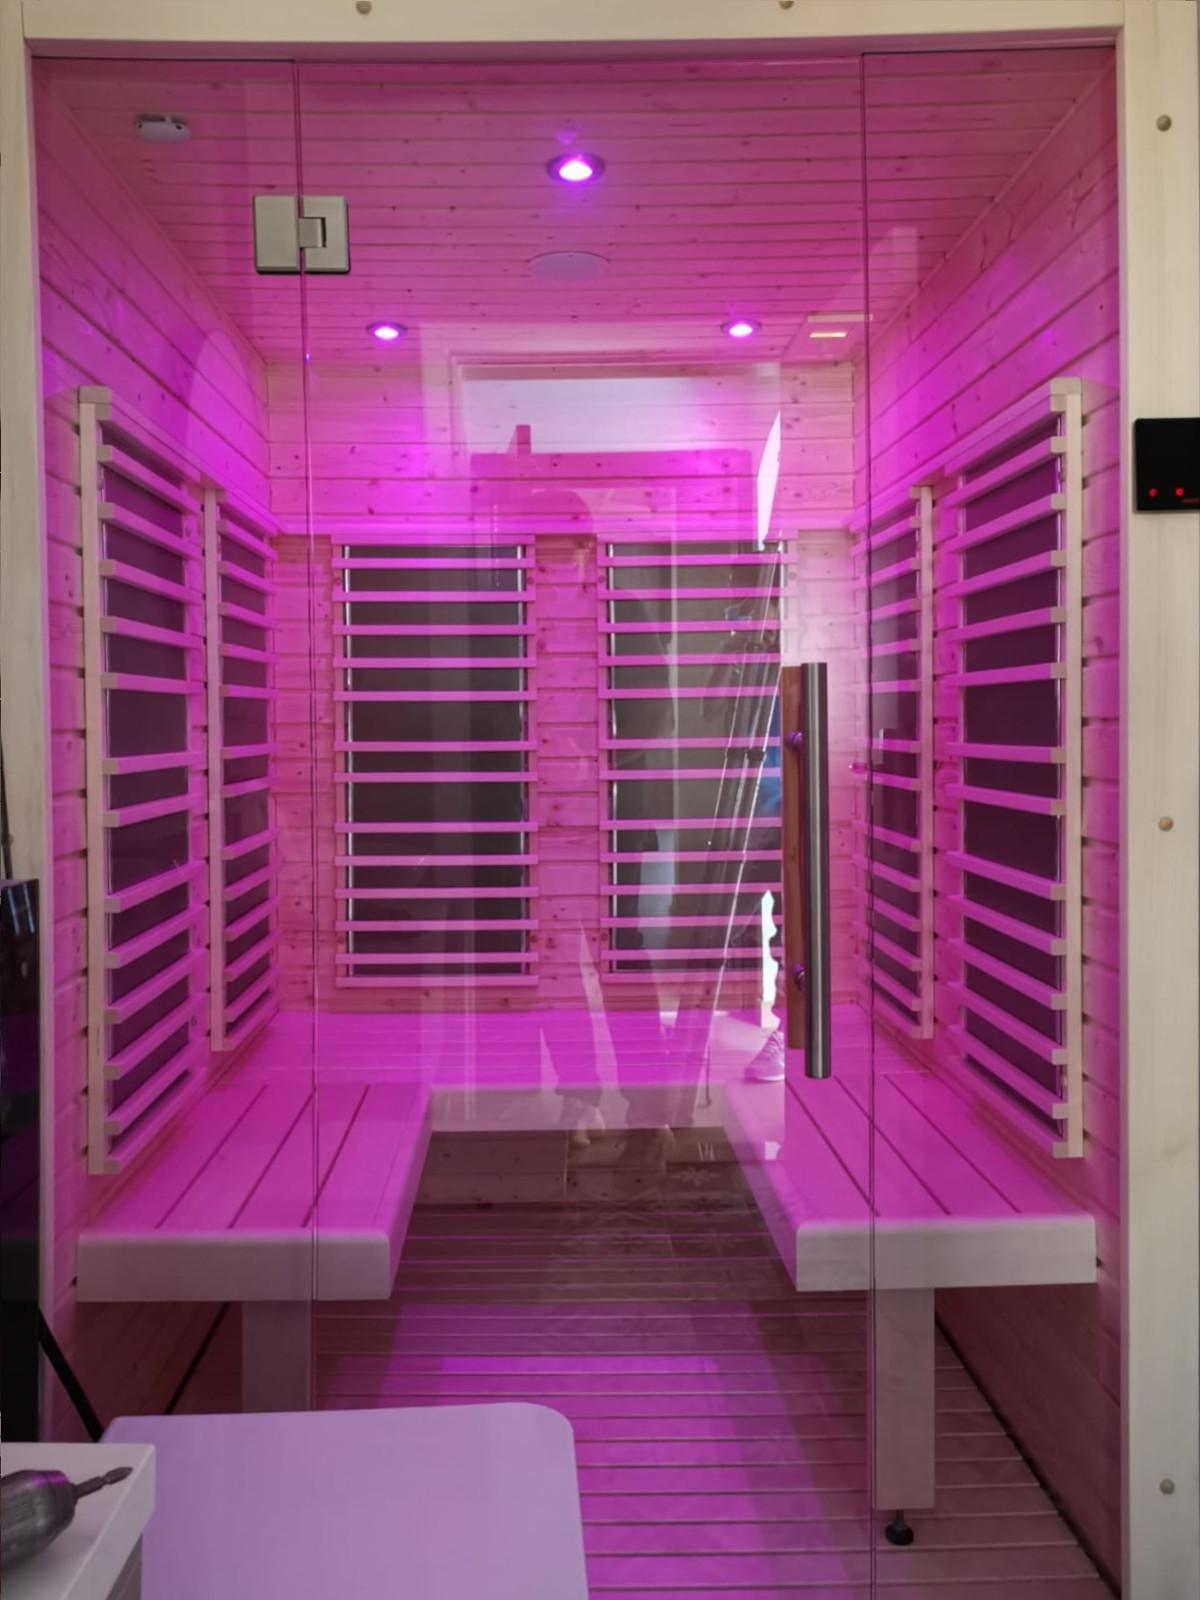 sauna ad infrarossi per bagno